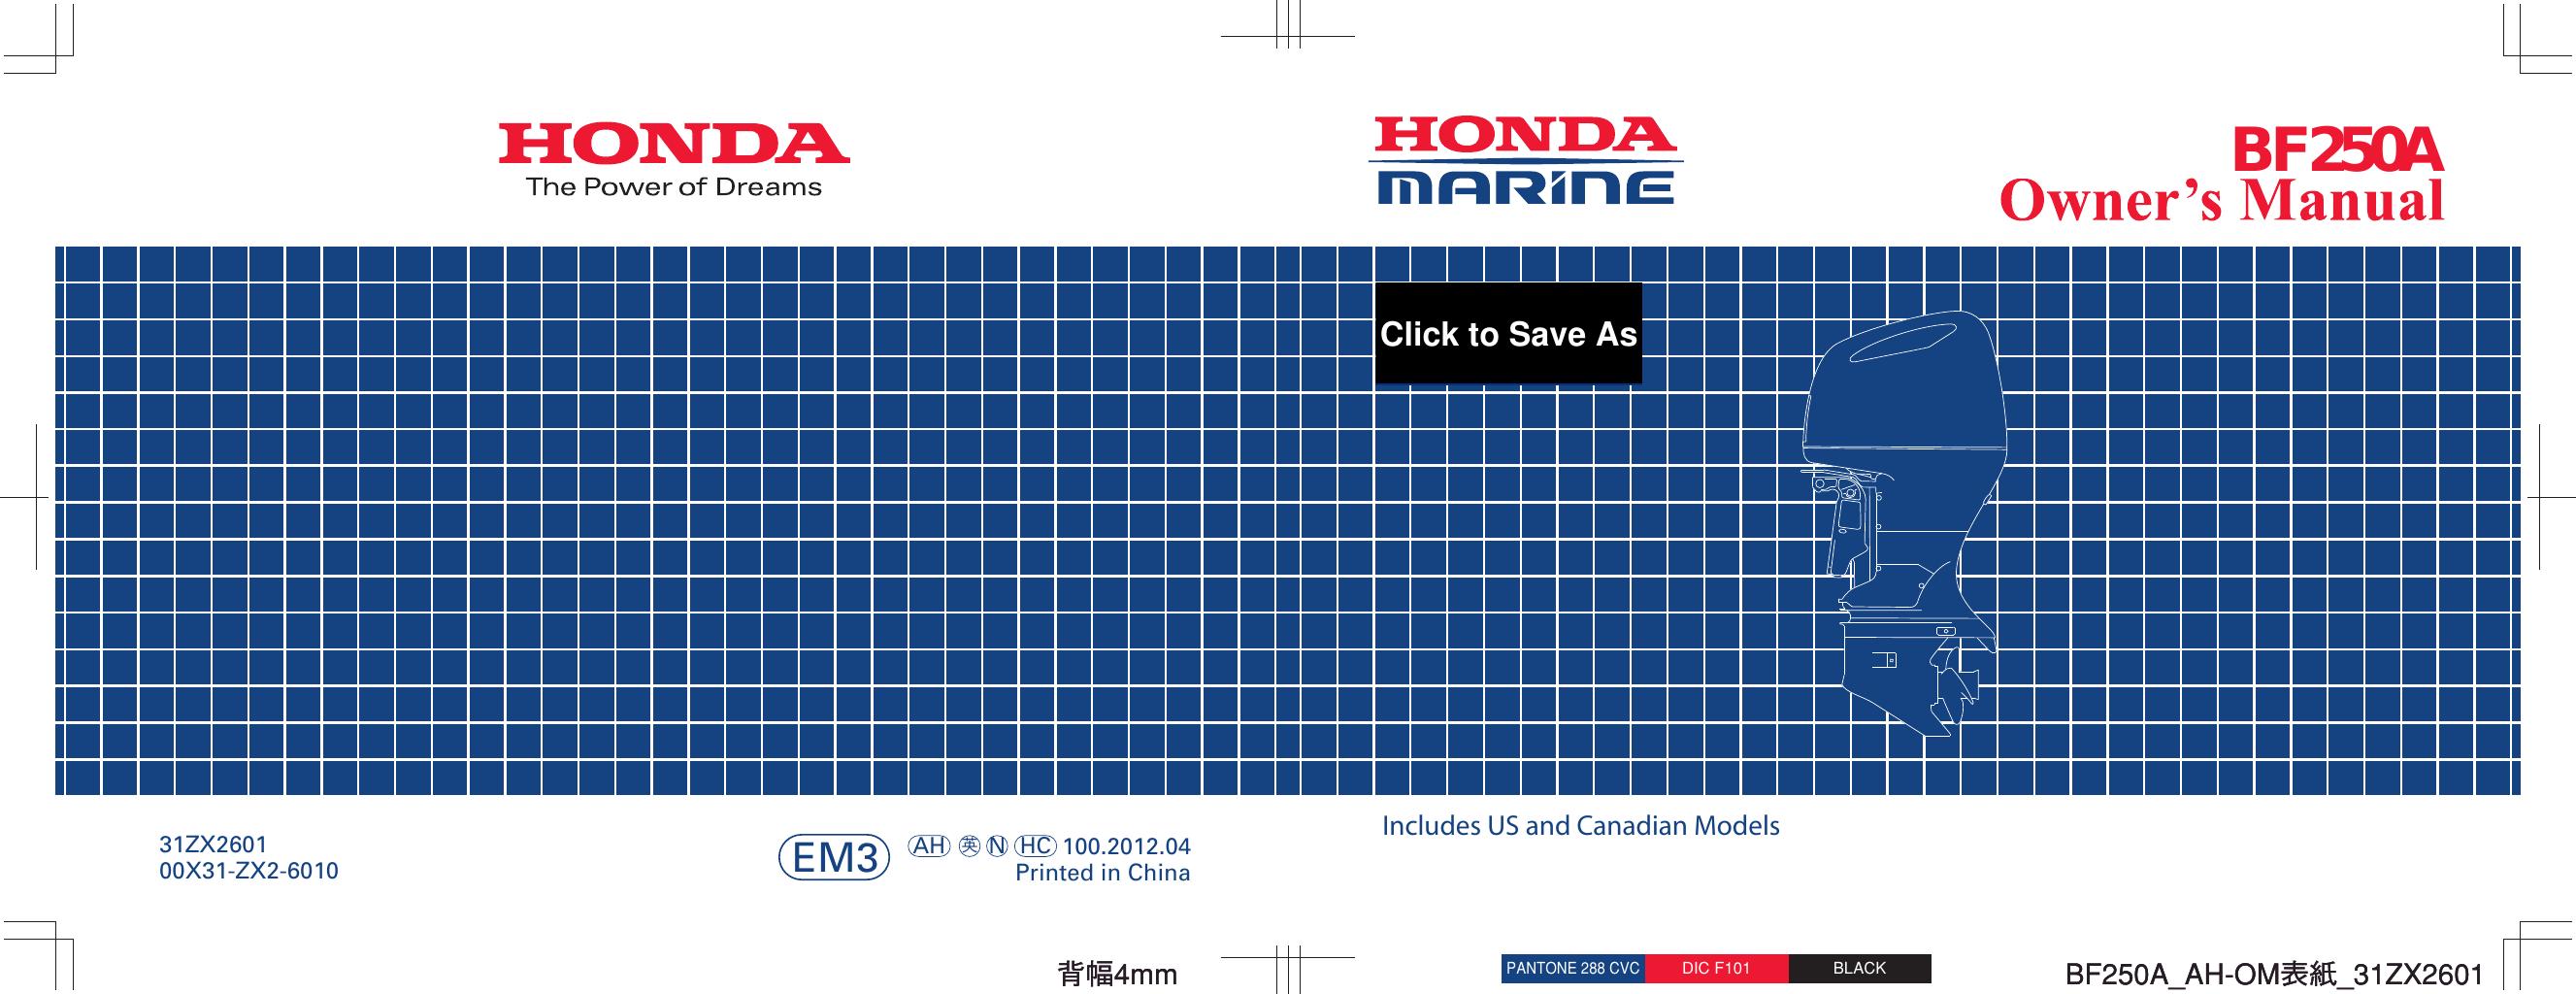 Honda Bf250 Bbjj 1000001 7999999 Owners Manual BF250A AH OM表紙_31ZX2600